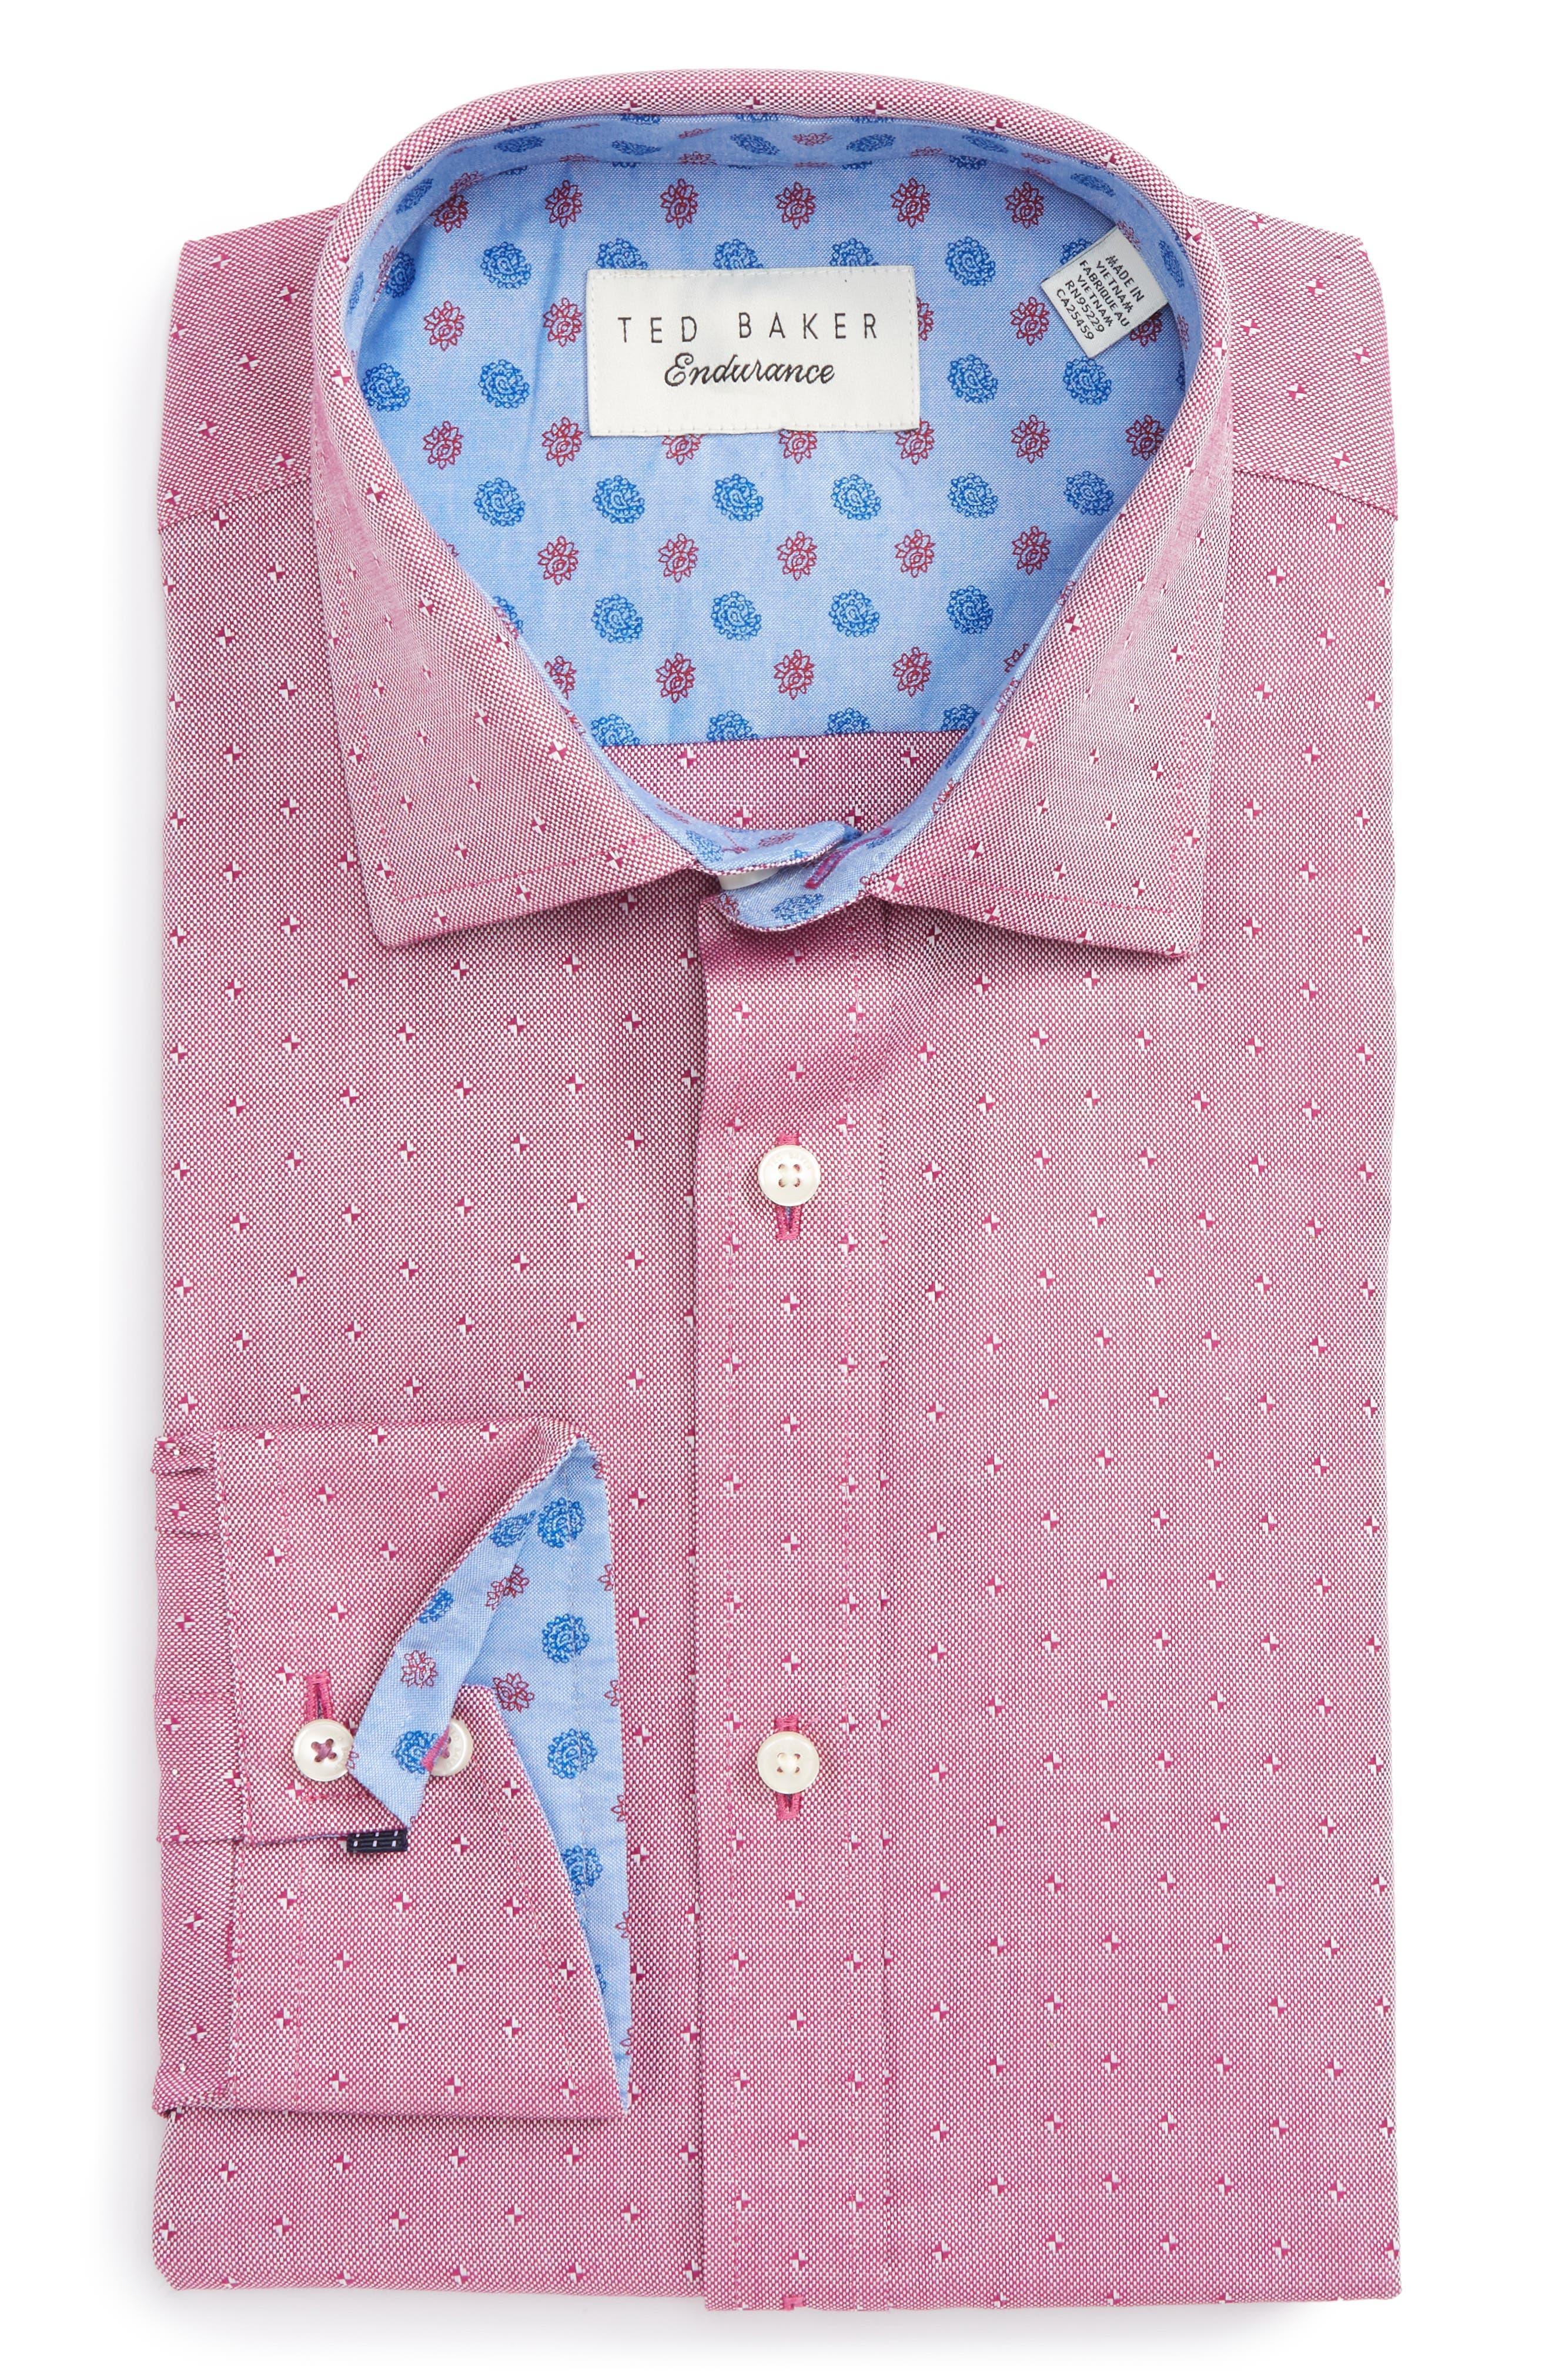 Jamer Trim Fit Dot Dress Shirt,                         Main,                         color, 611